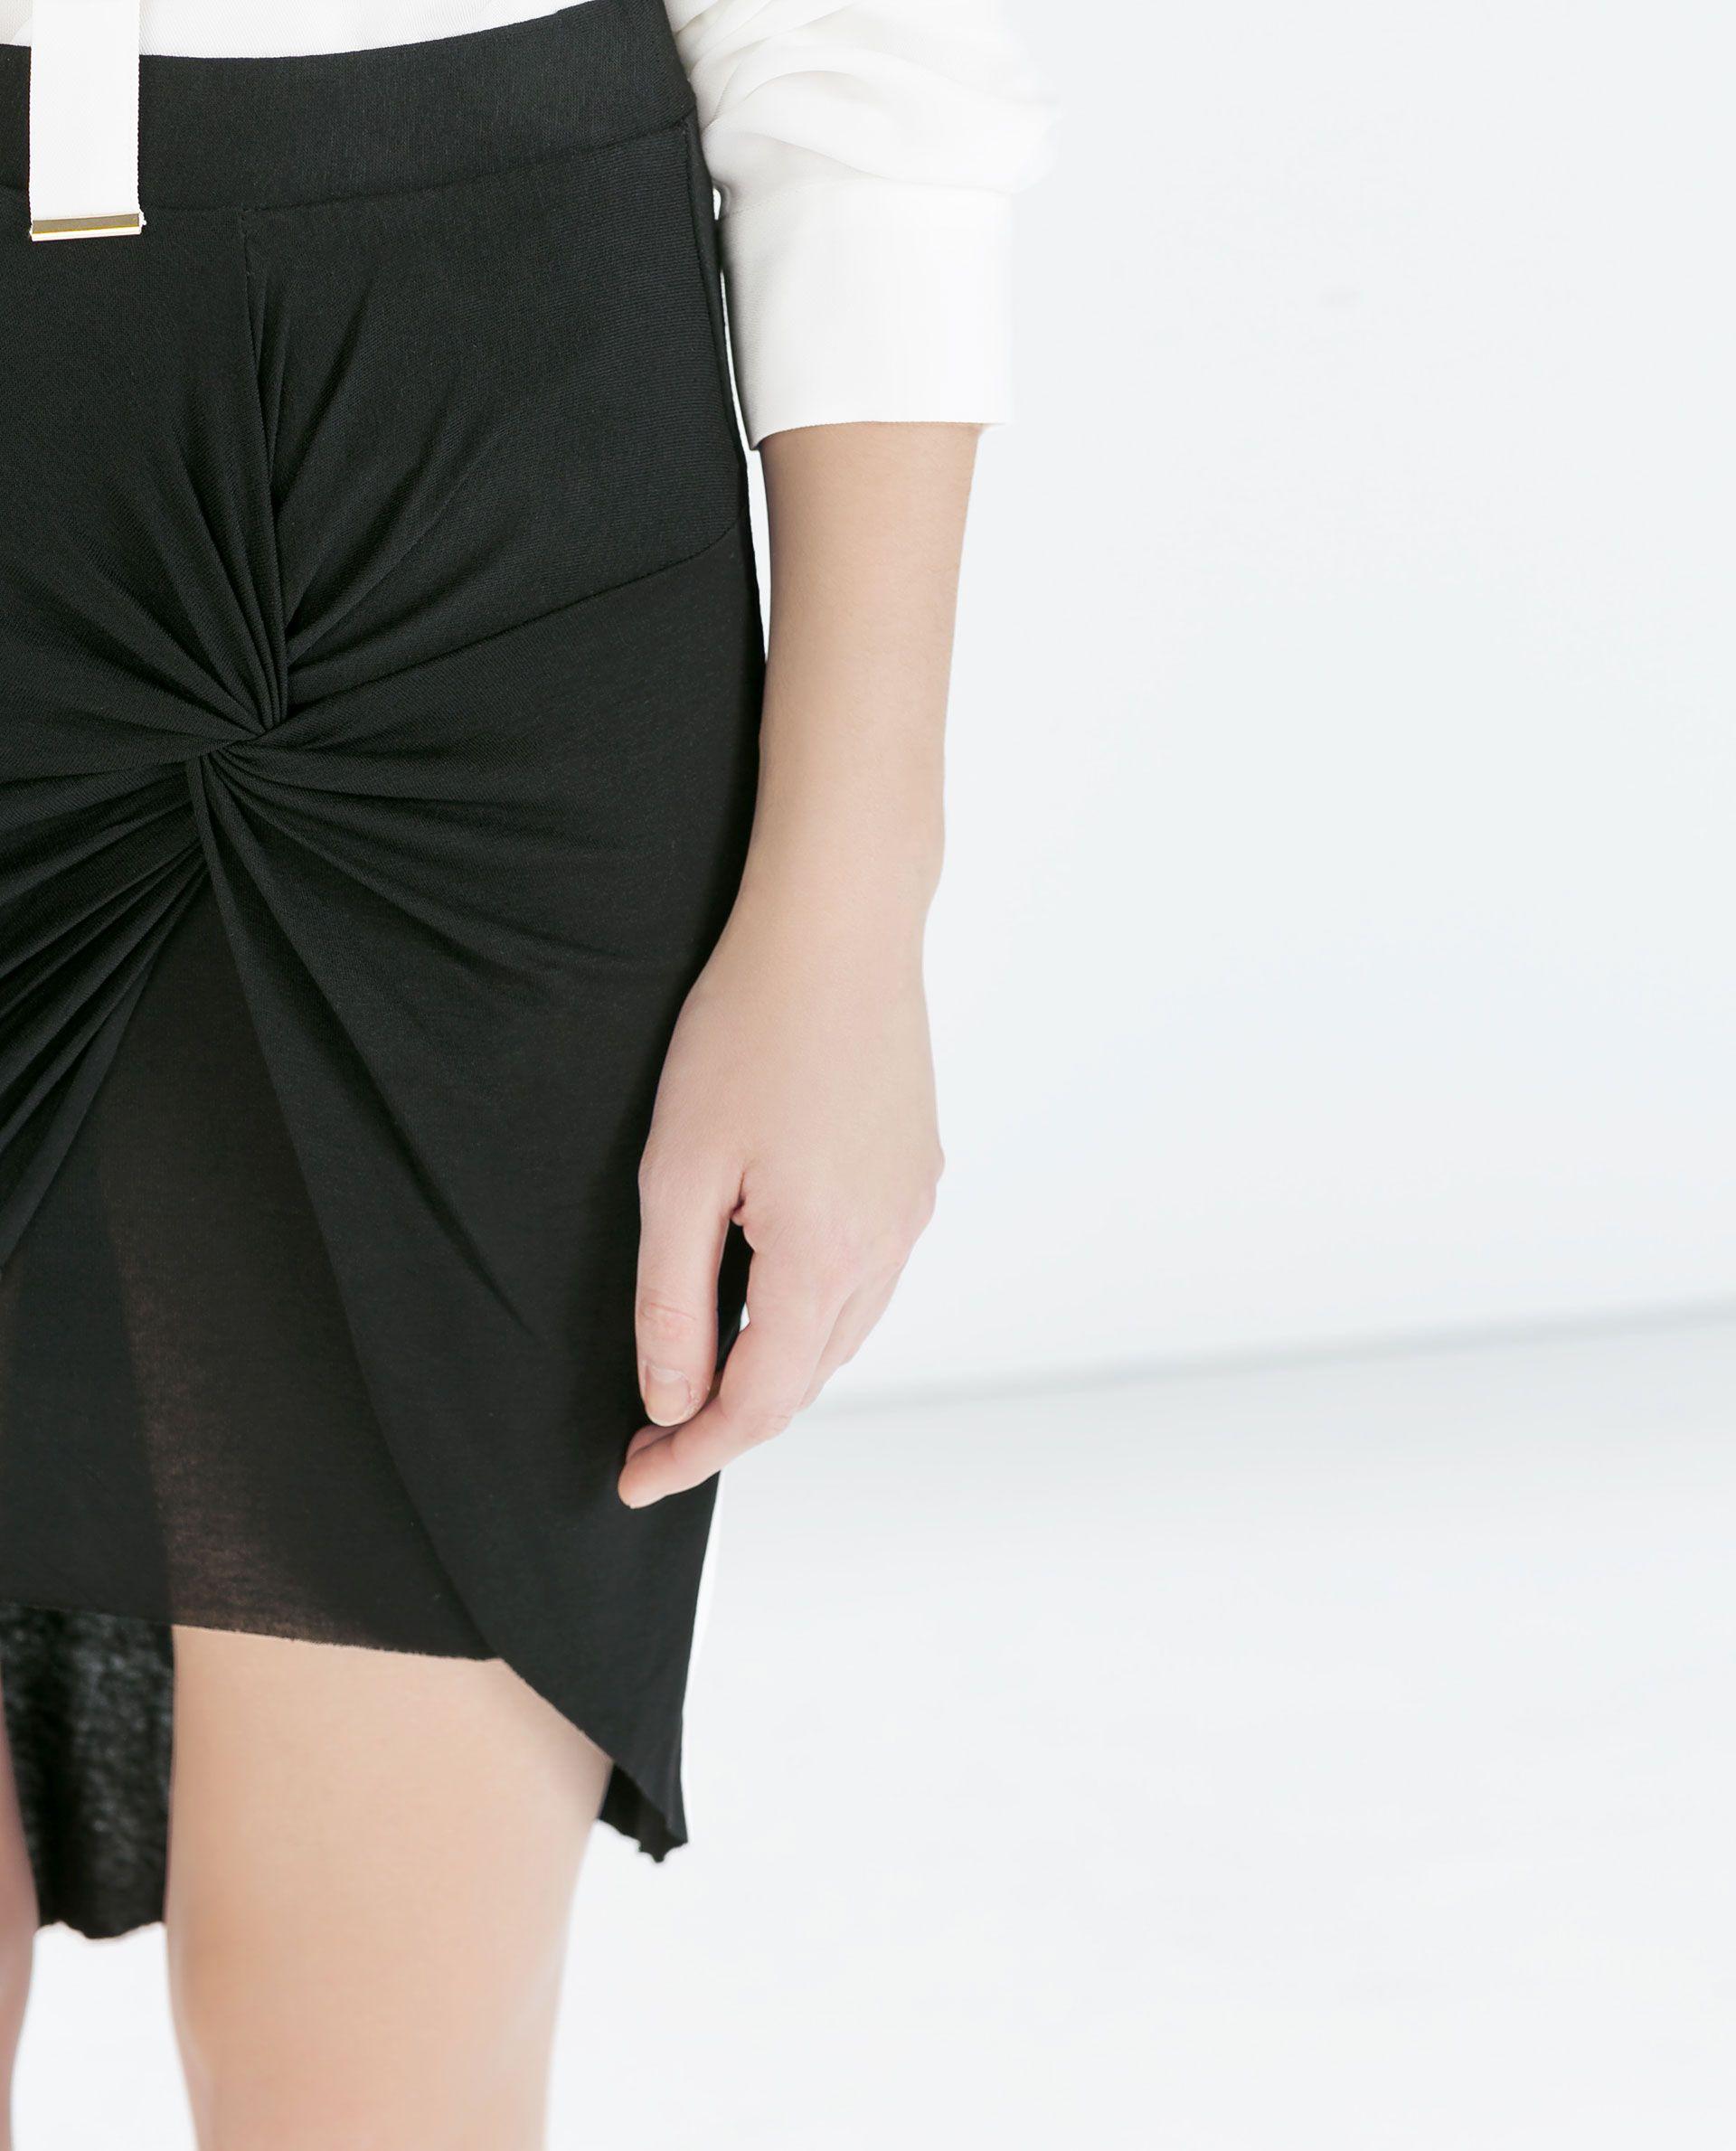 Zara Asimetrica Nudo Falda Corta Mujer Short Zara Faldas RxqrpR6wIt bd86ff9553db